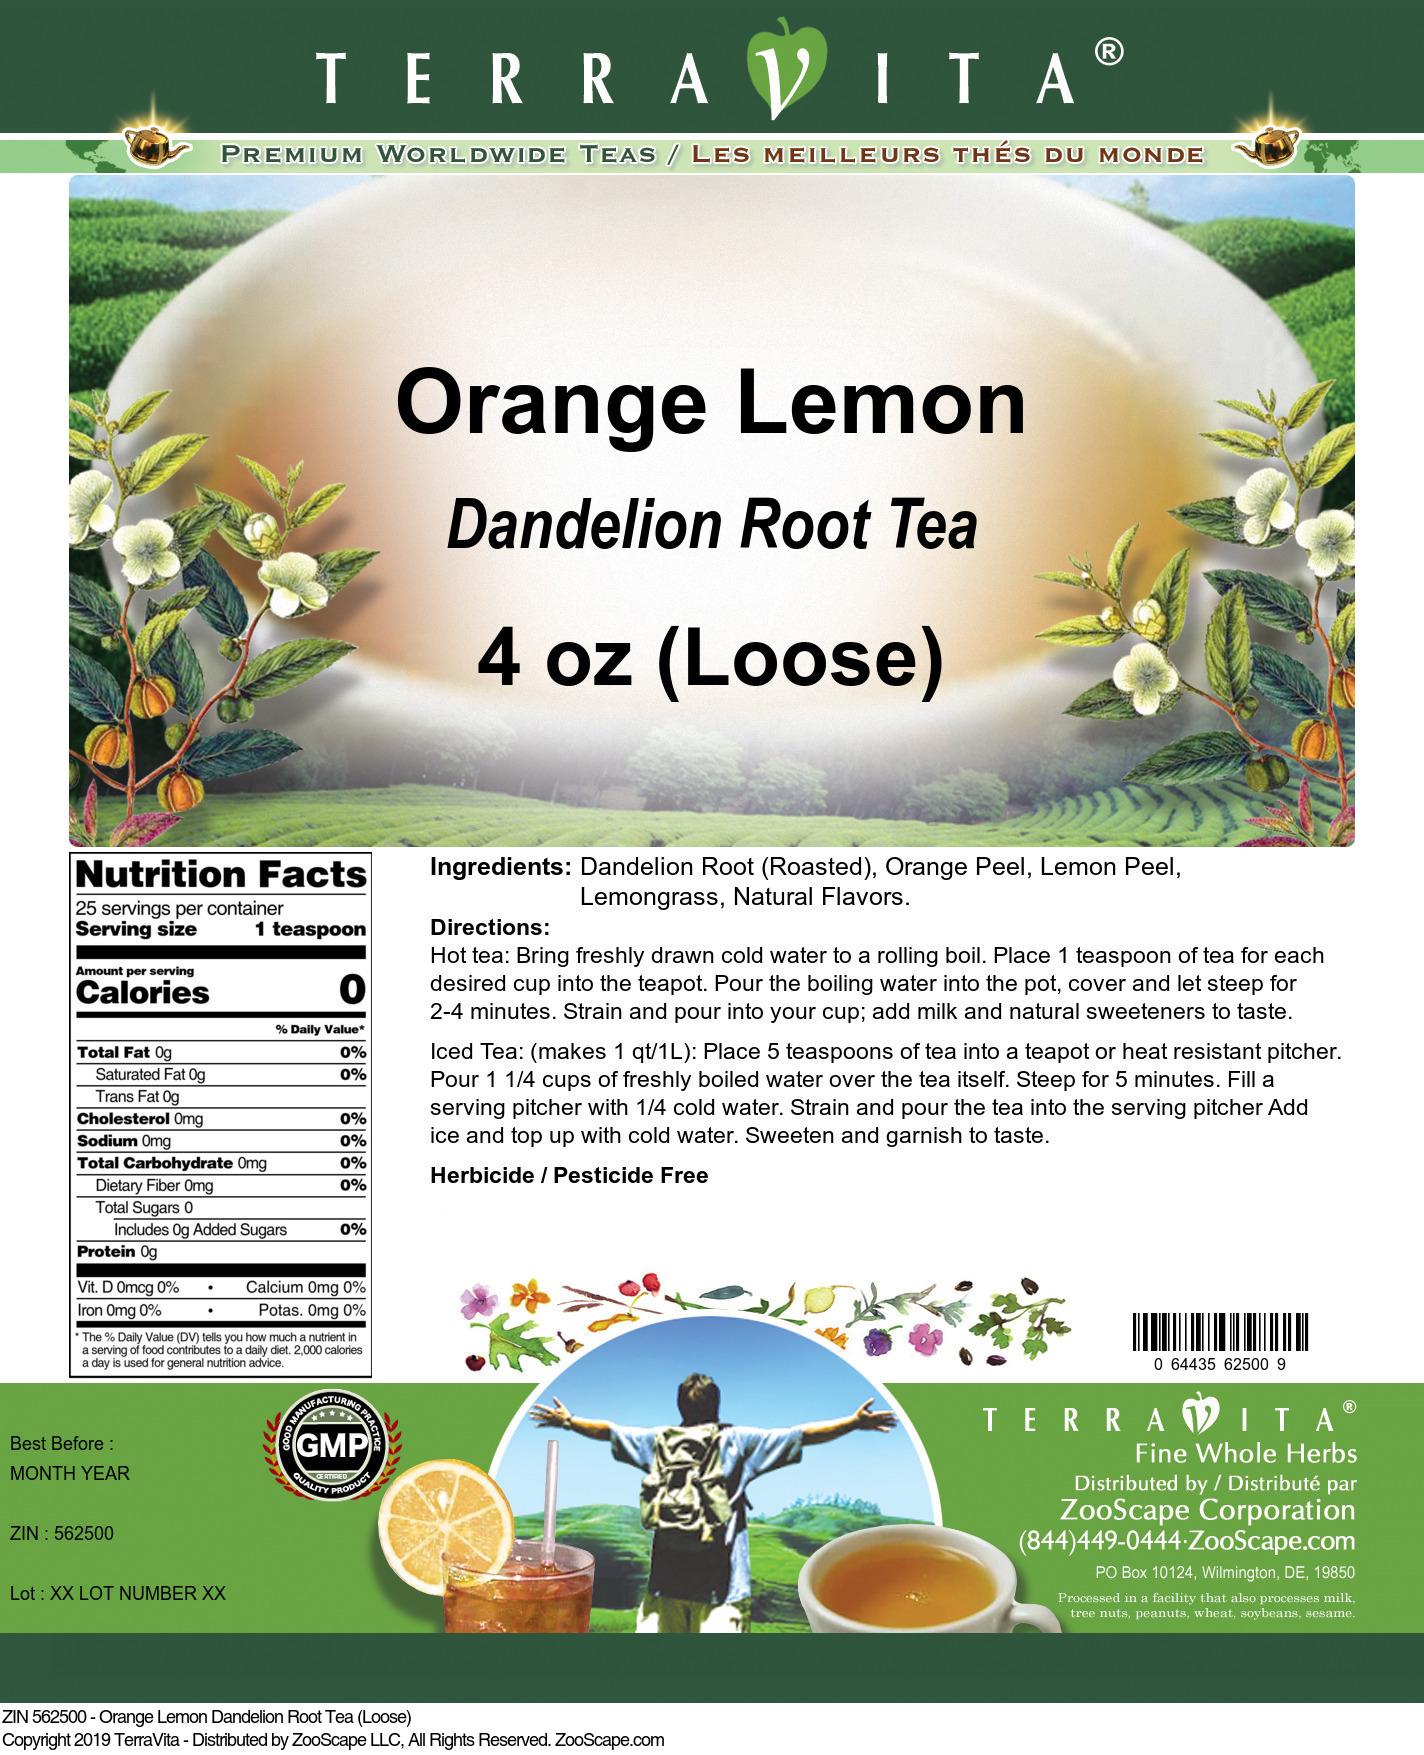 Orange Lemon Dandelion Root Tea (Loose)